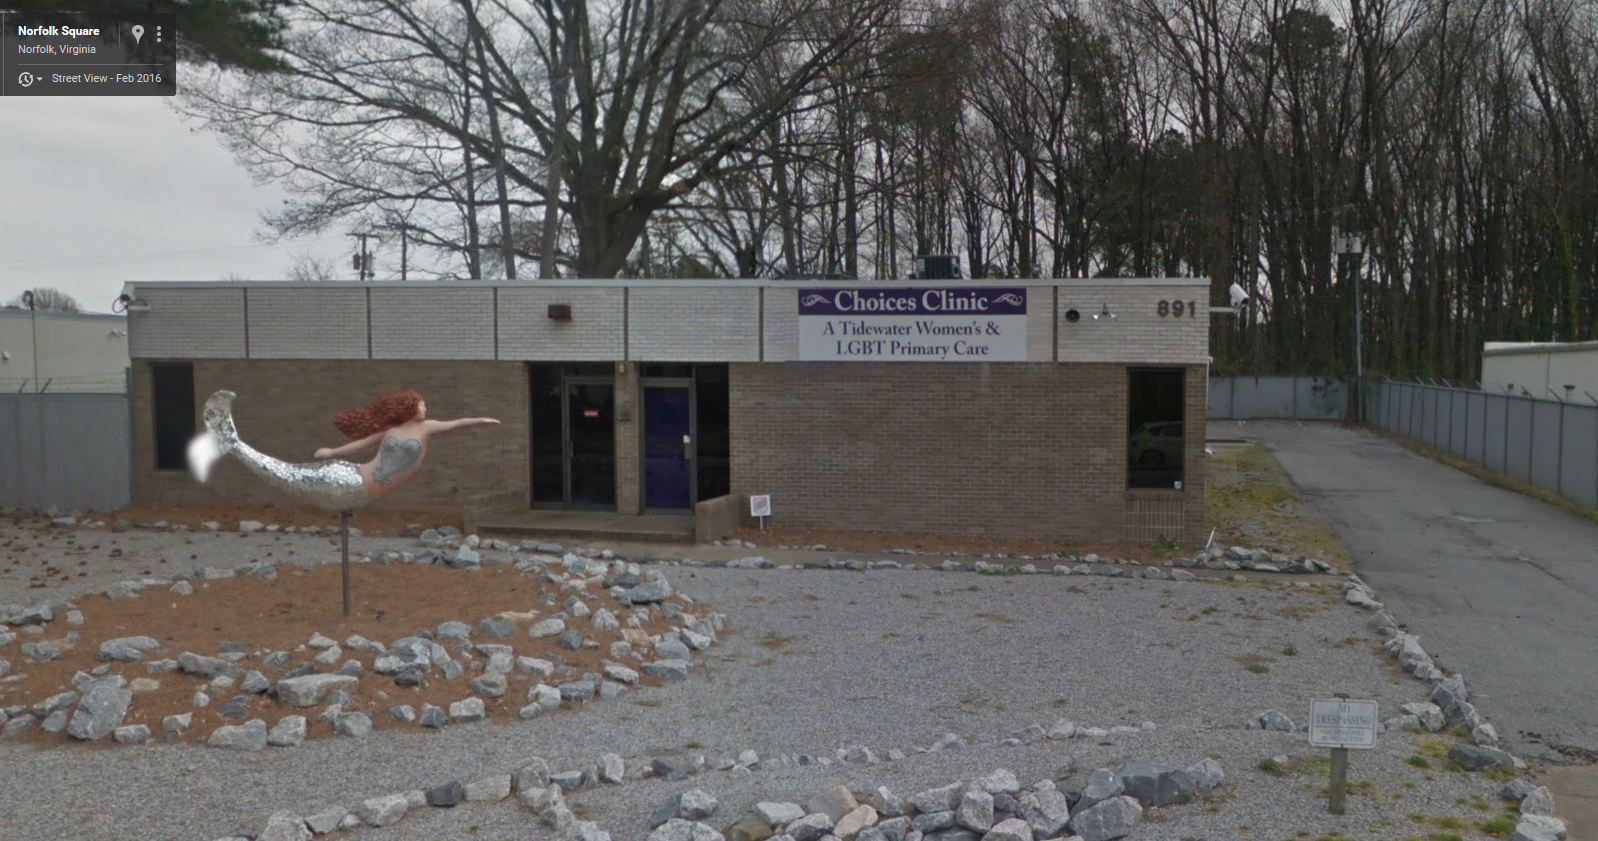 Norfolk, VA - A Tidewater Women's Health 5